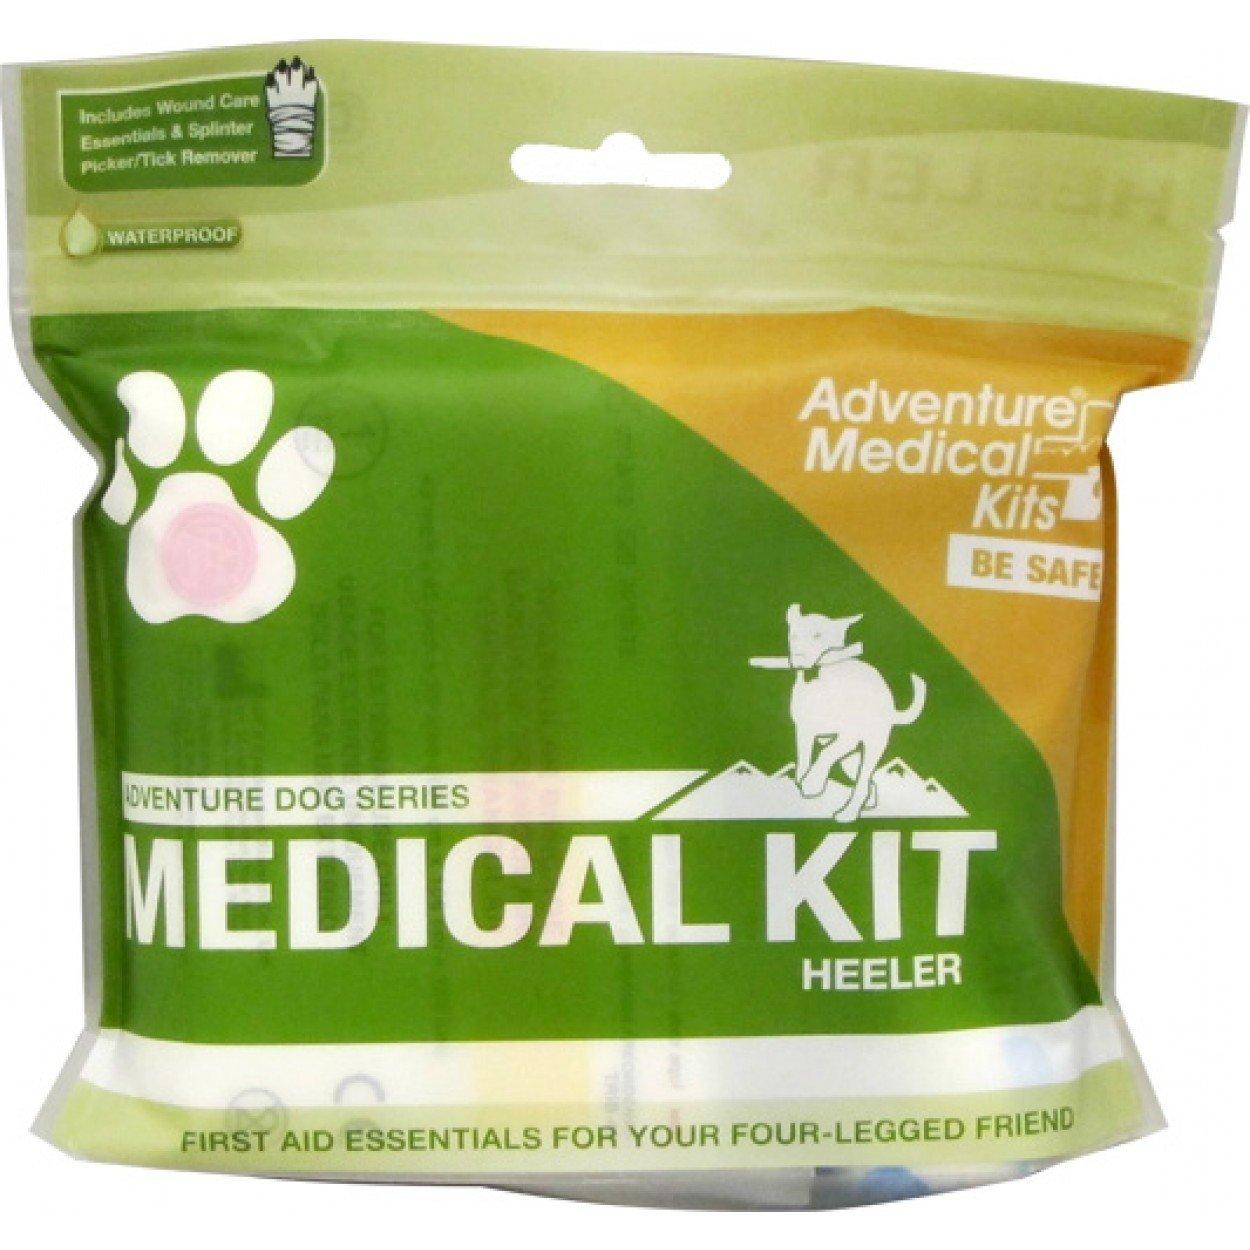 Adventure Medical Kit Adventure Dog Series Heeler